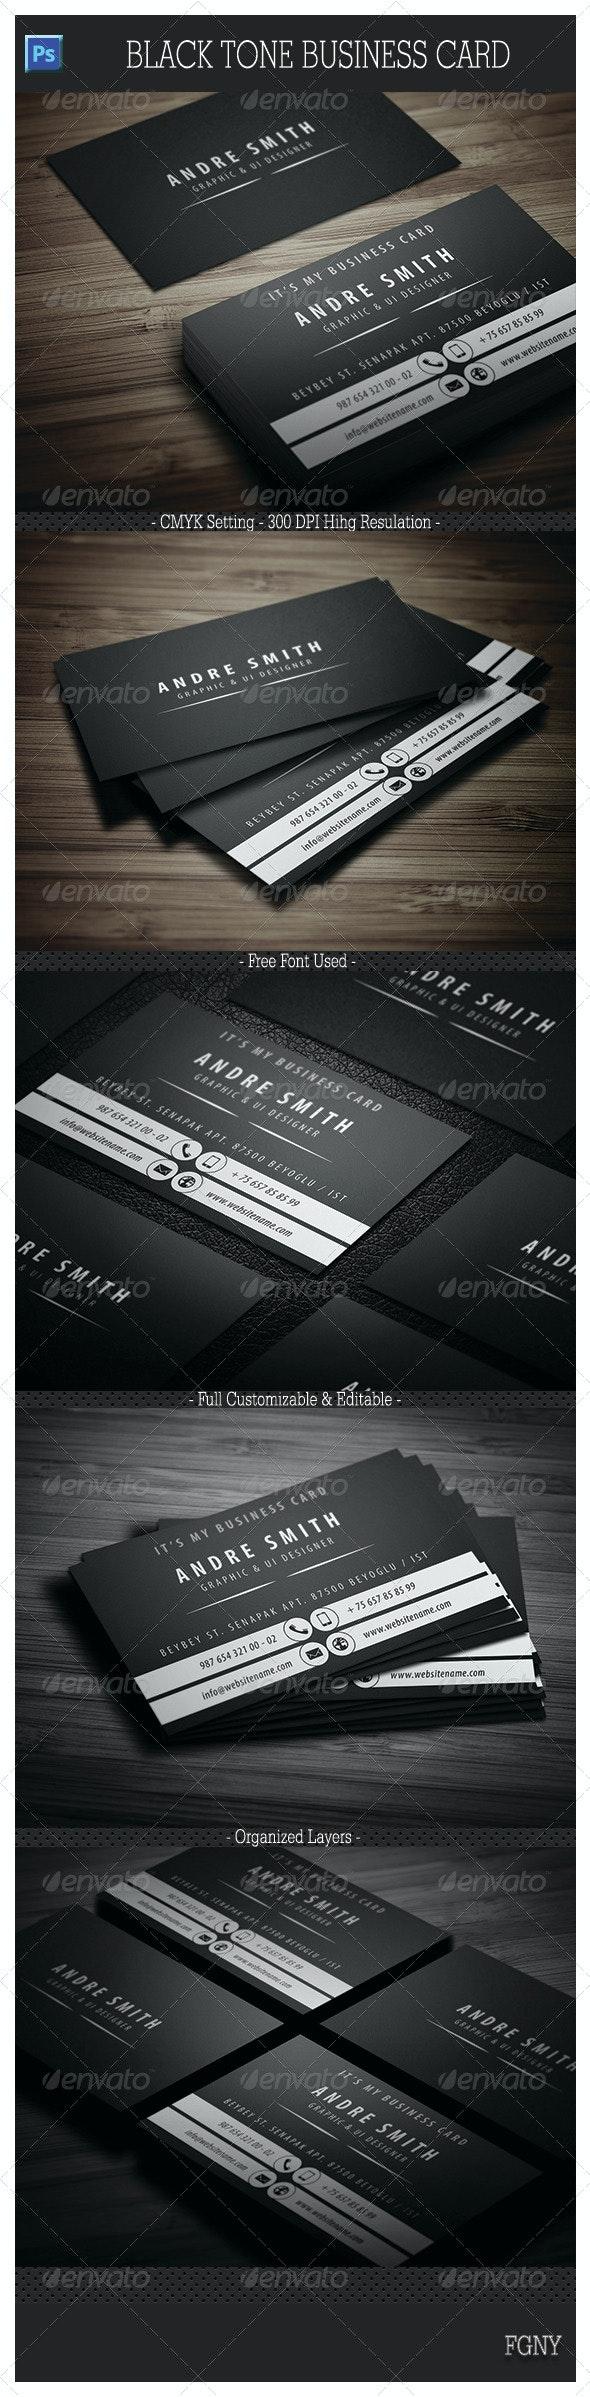 Black Tone Business Card  - Creative Business Cards